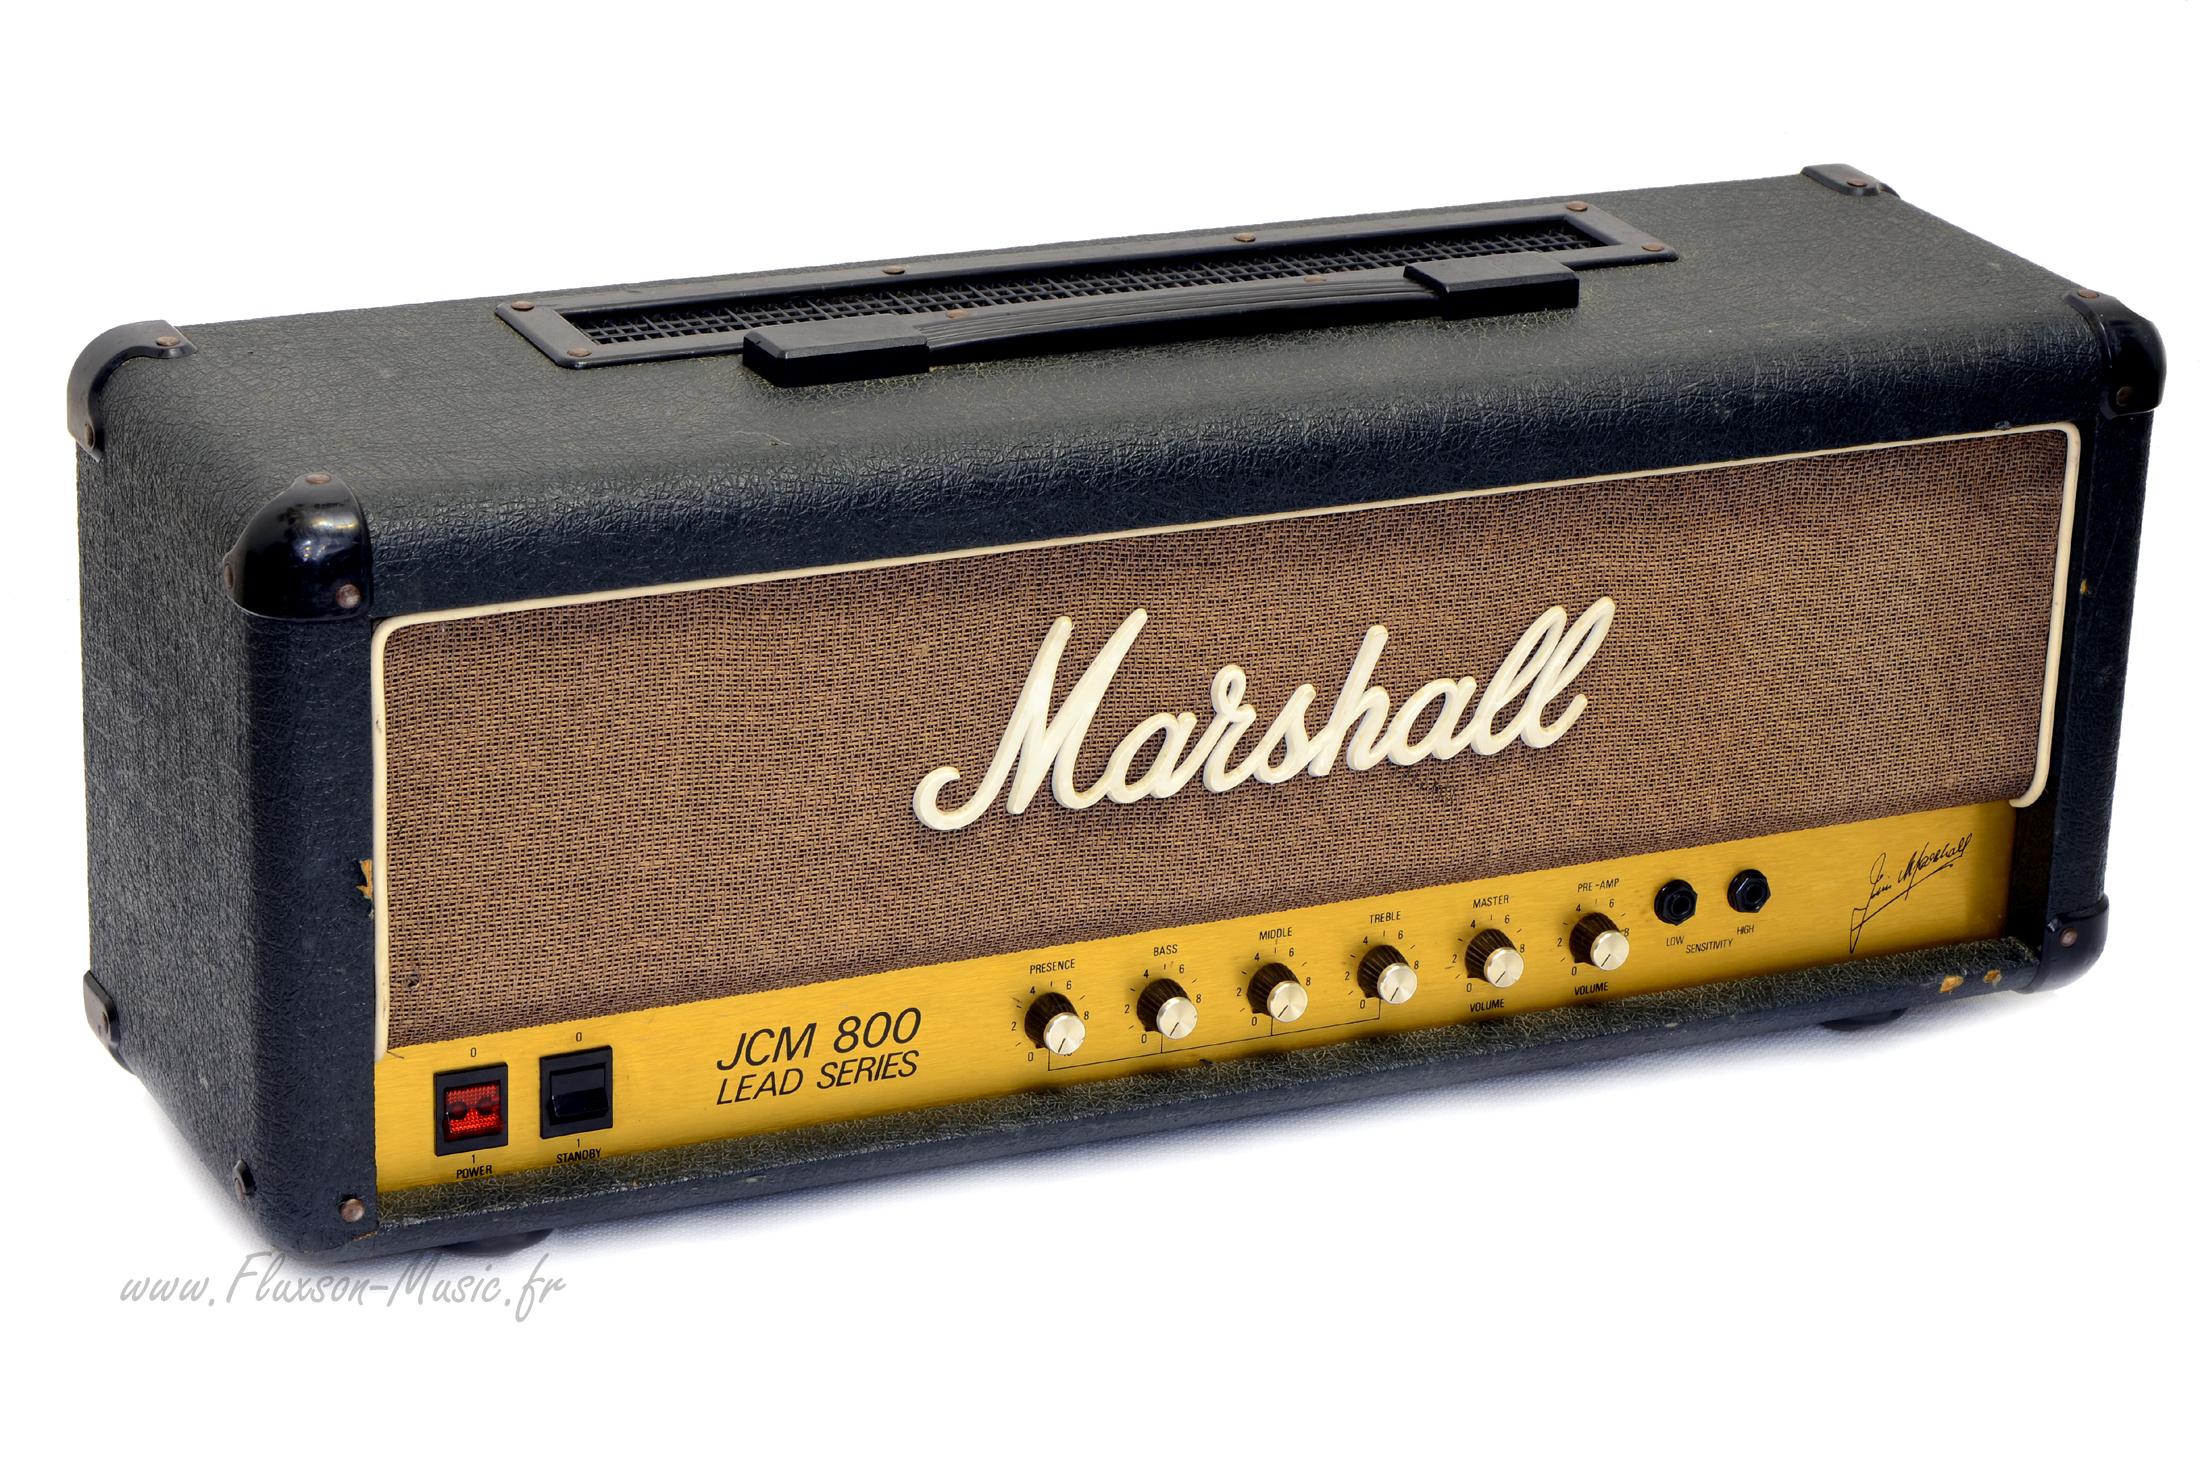 800 marshall jcm Is my